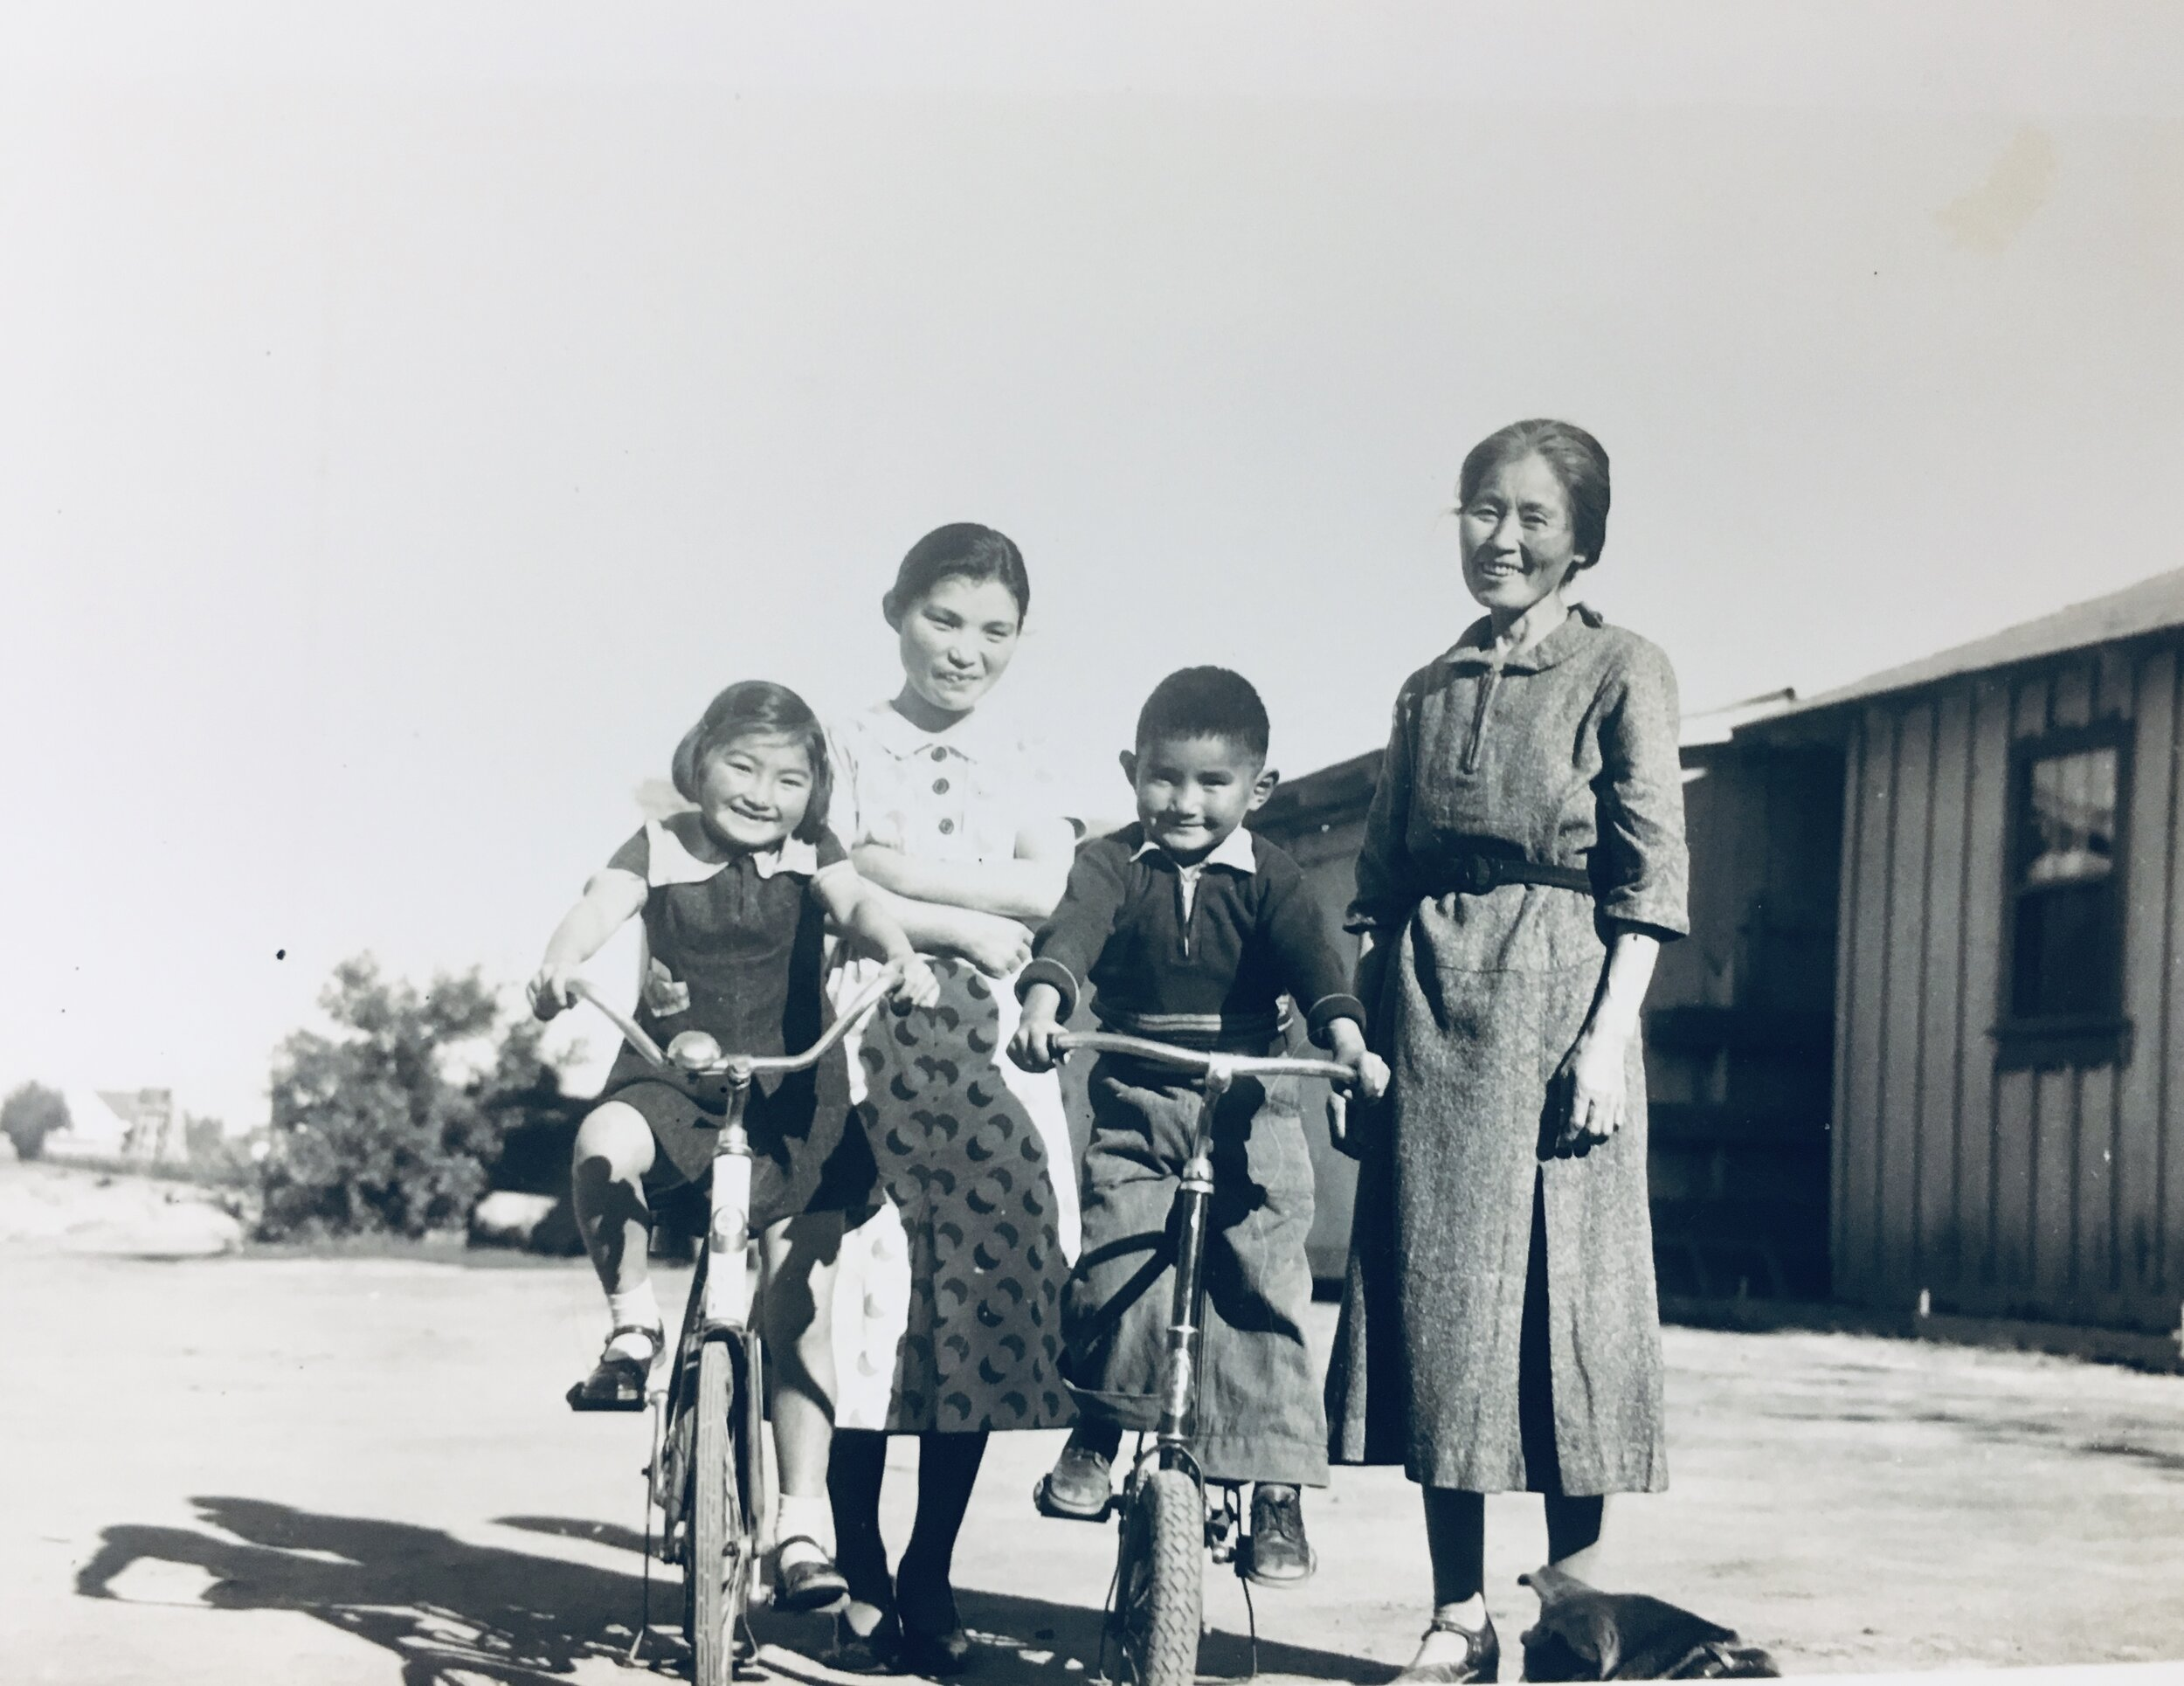 Rose, her mother Kikuyo Yonemoto Ito, her brother Roy Minoru Ito, and her grandmother, Chiyo Ito in Salinas, CA.